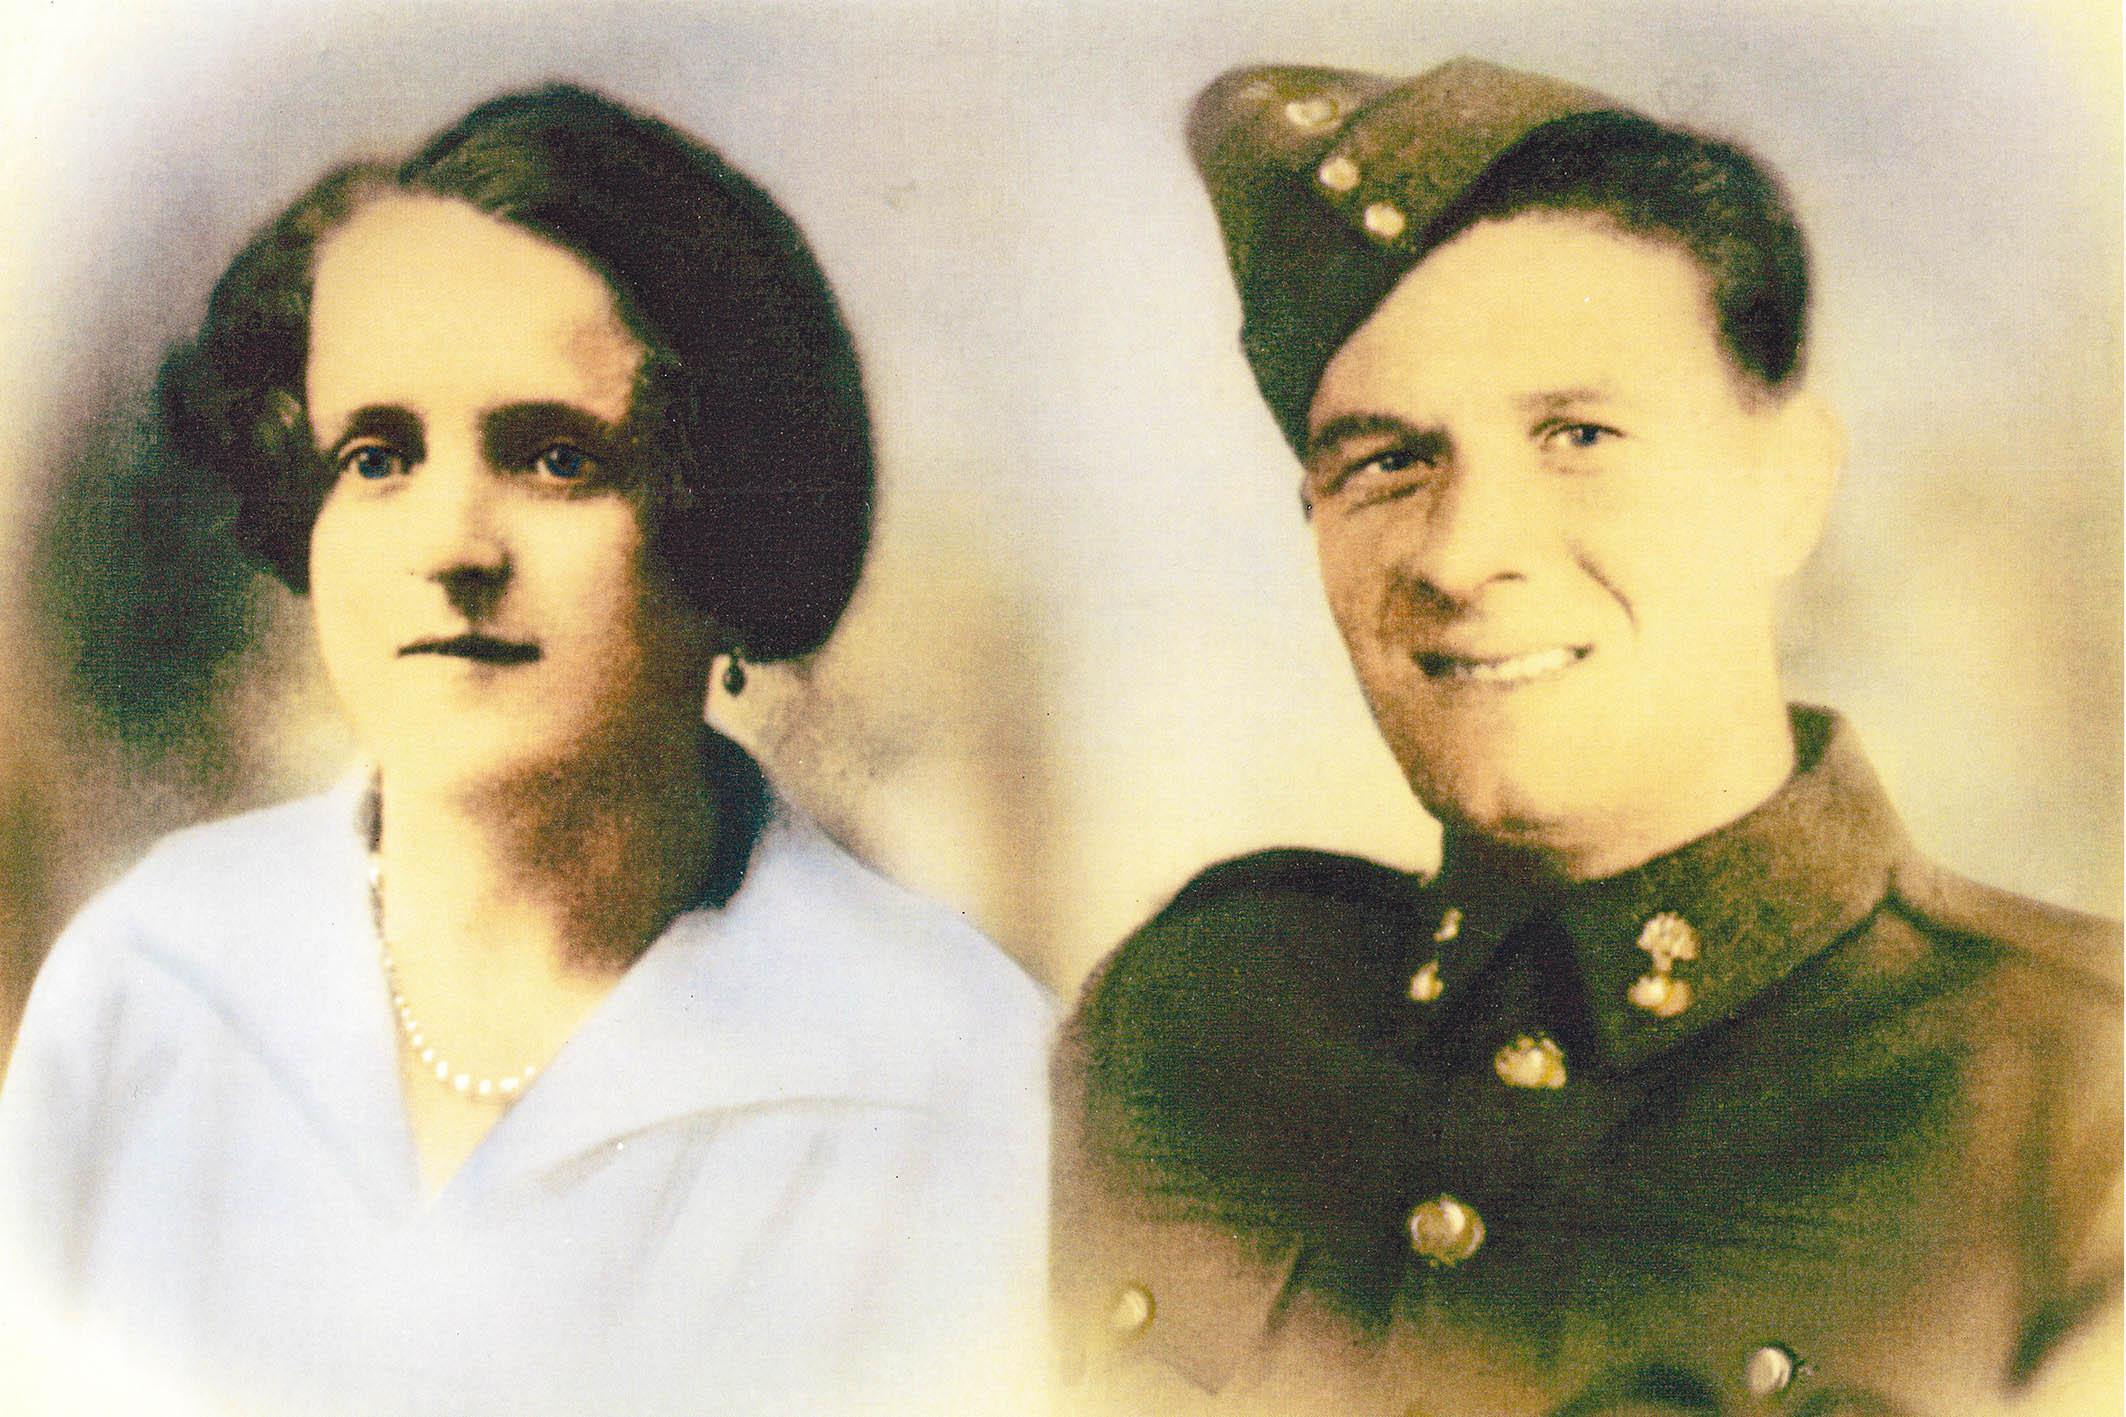 Fusilier John McGarvey and his wife Jane c. 1939